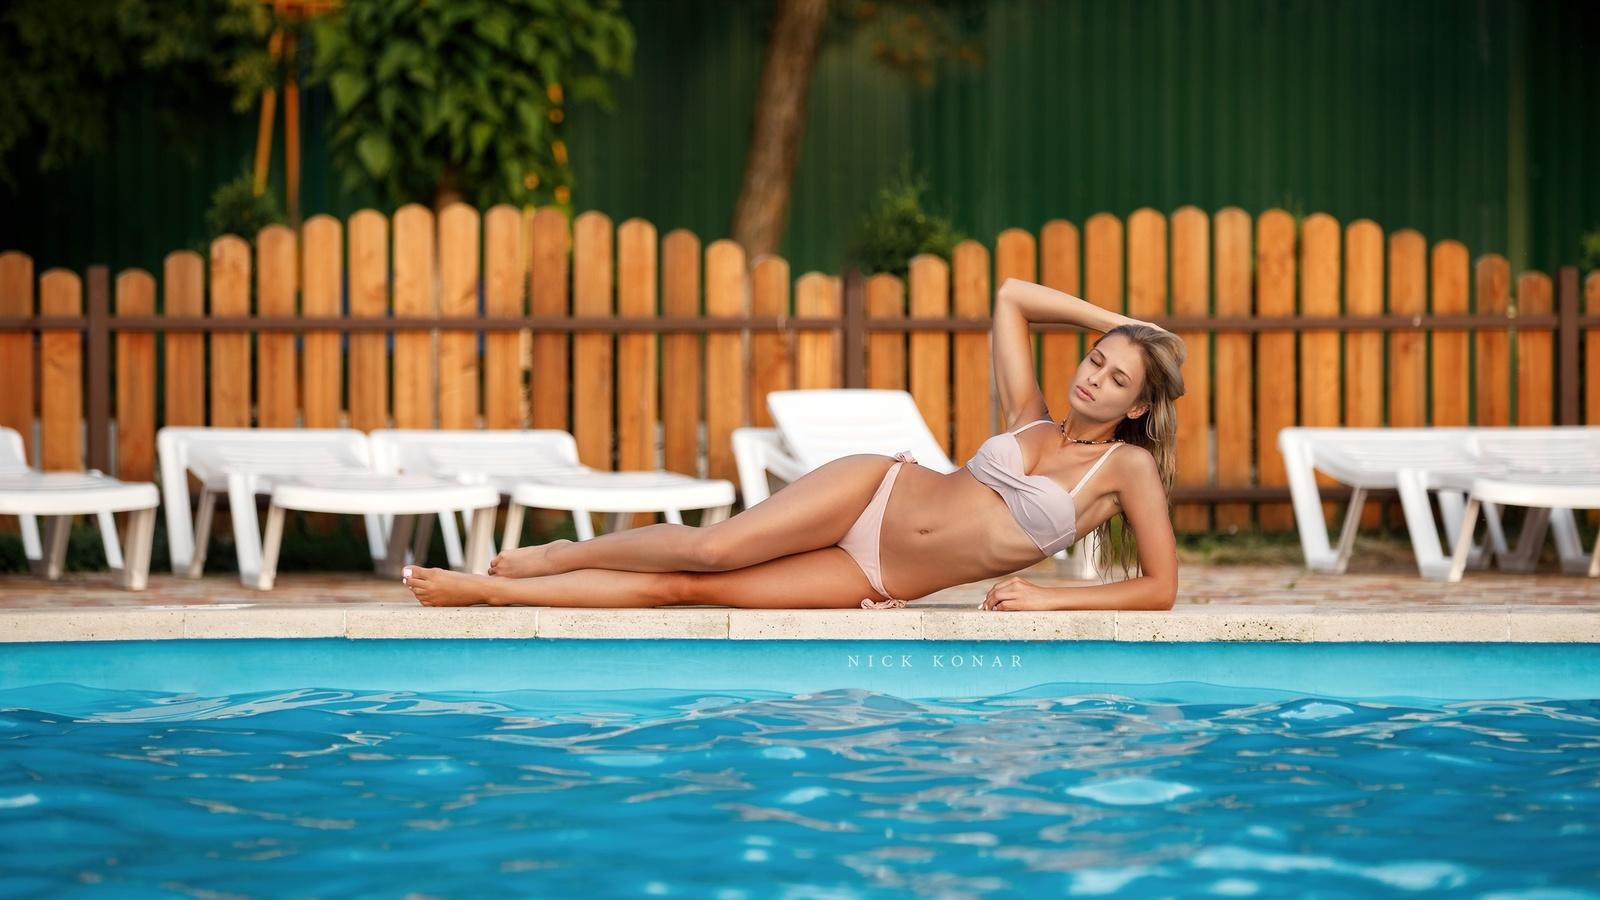 women, swimming pool, brunette, women outdoors, bikini, armpits, closed eyes, hips, ribs, trees, blonde, nick konar,николай конарев